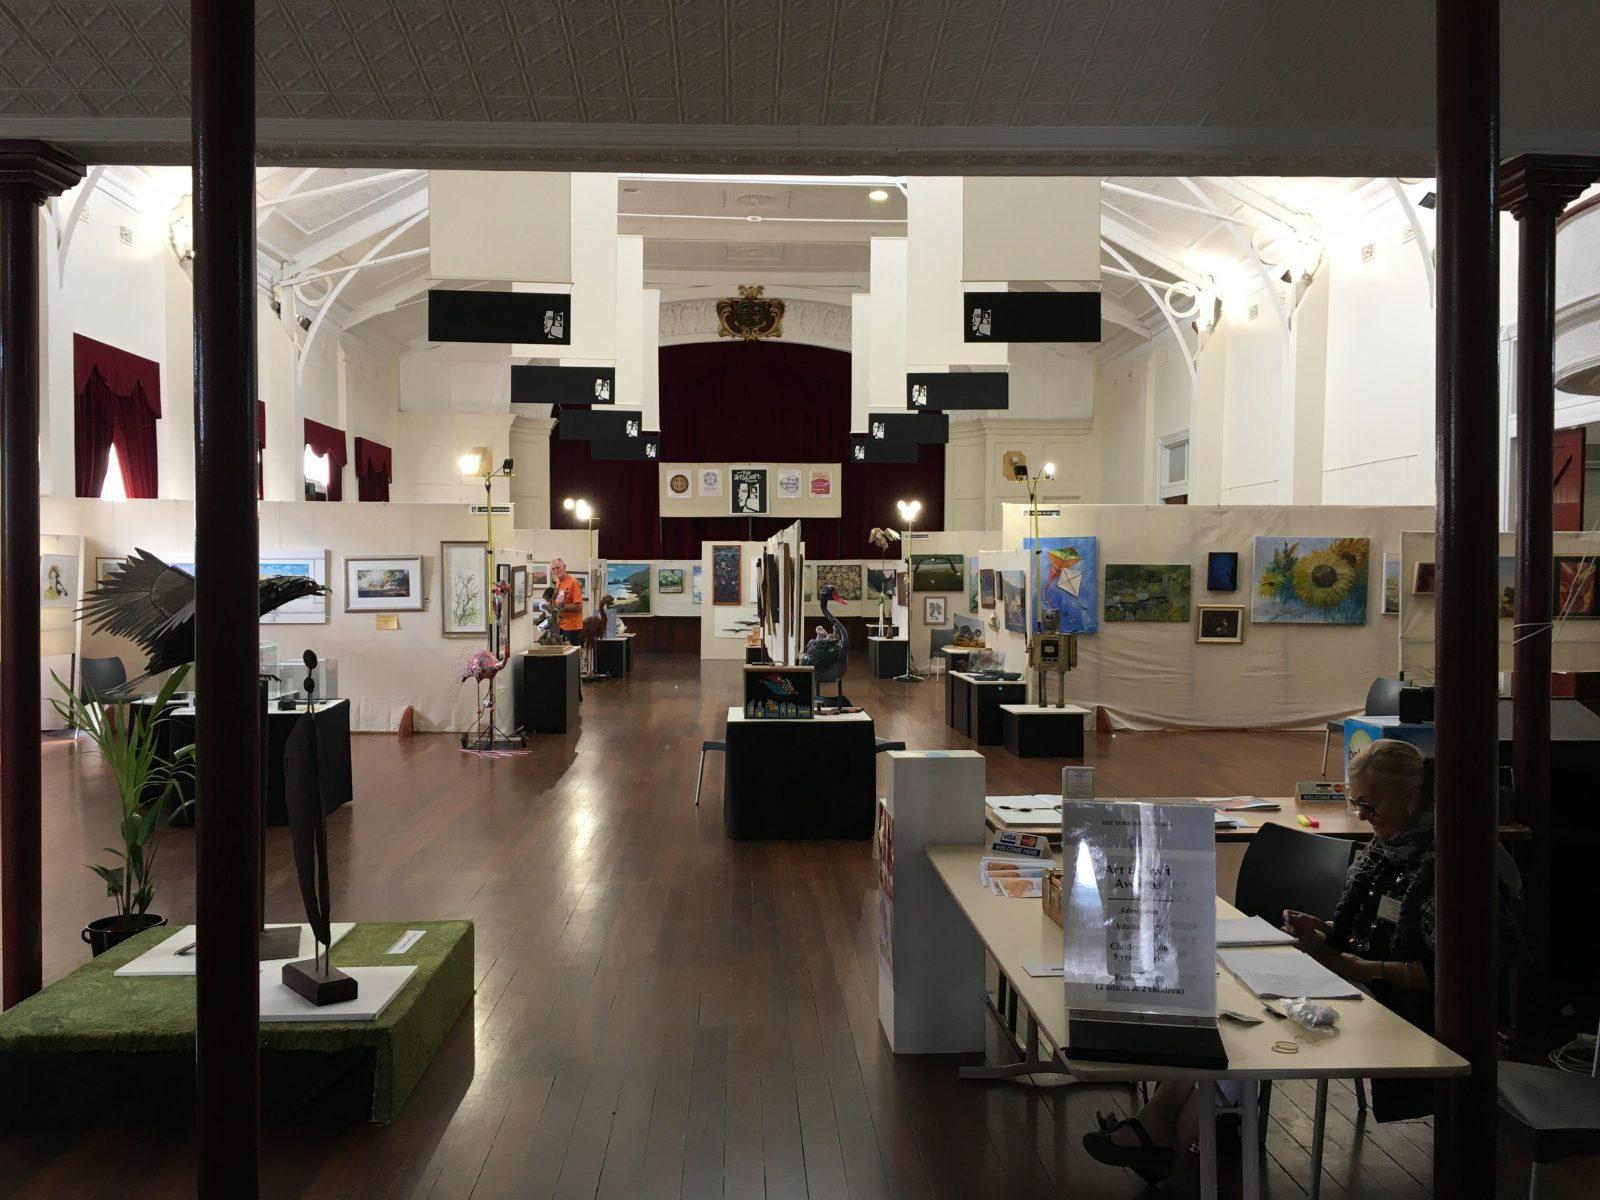 York Art and Craft Awards, York, Western Australia